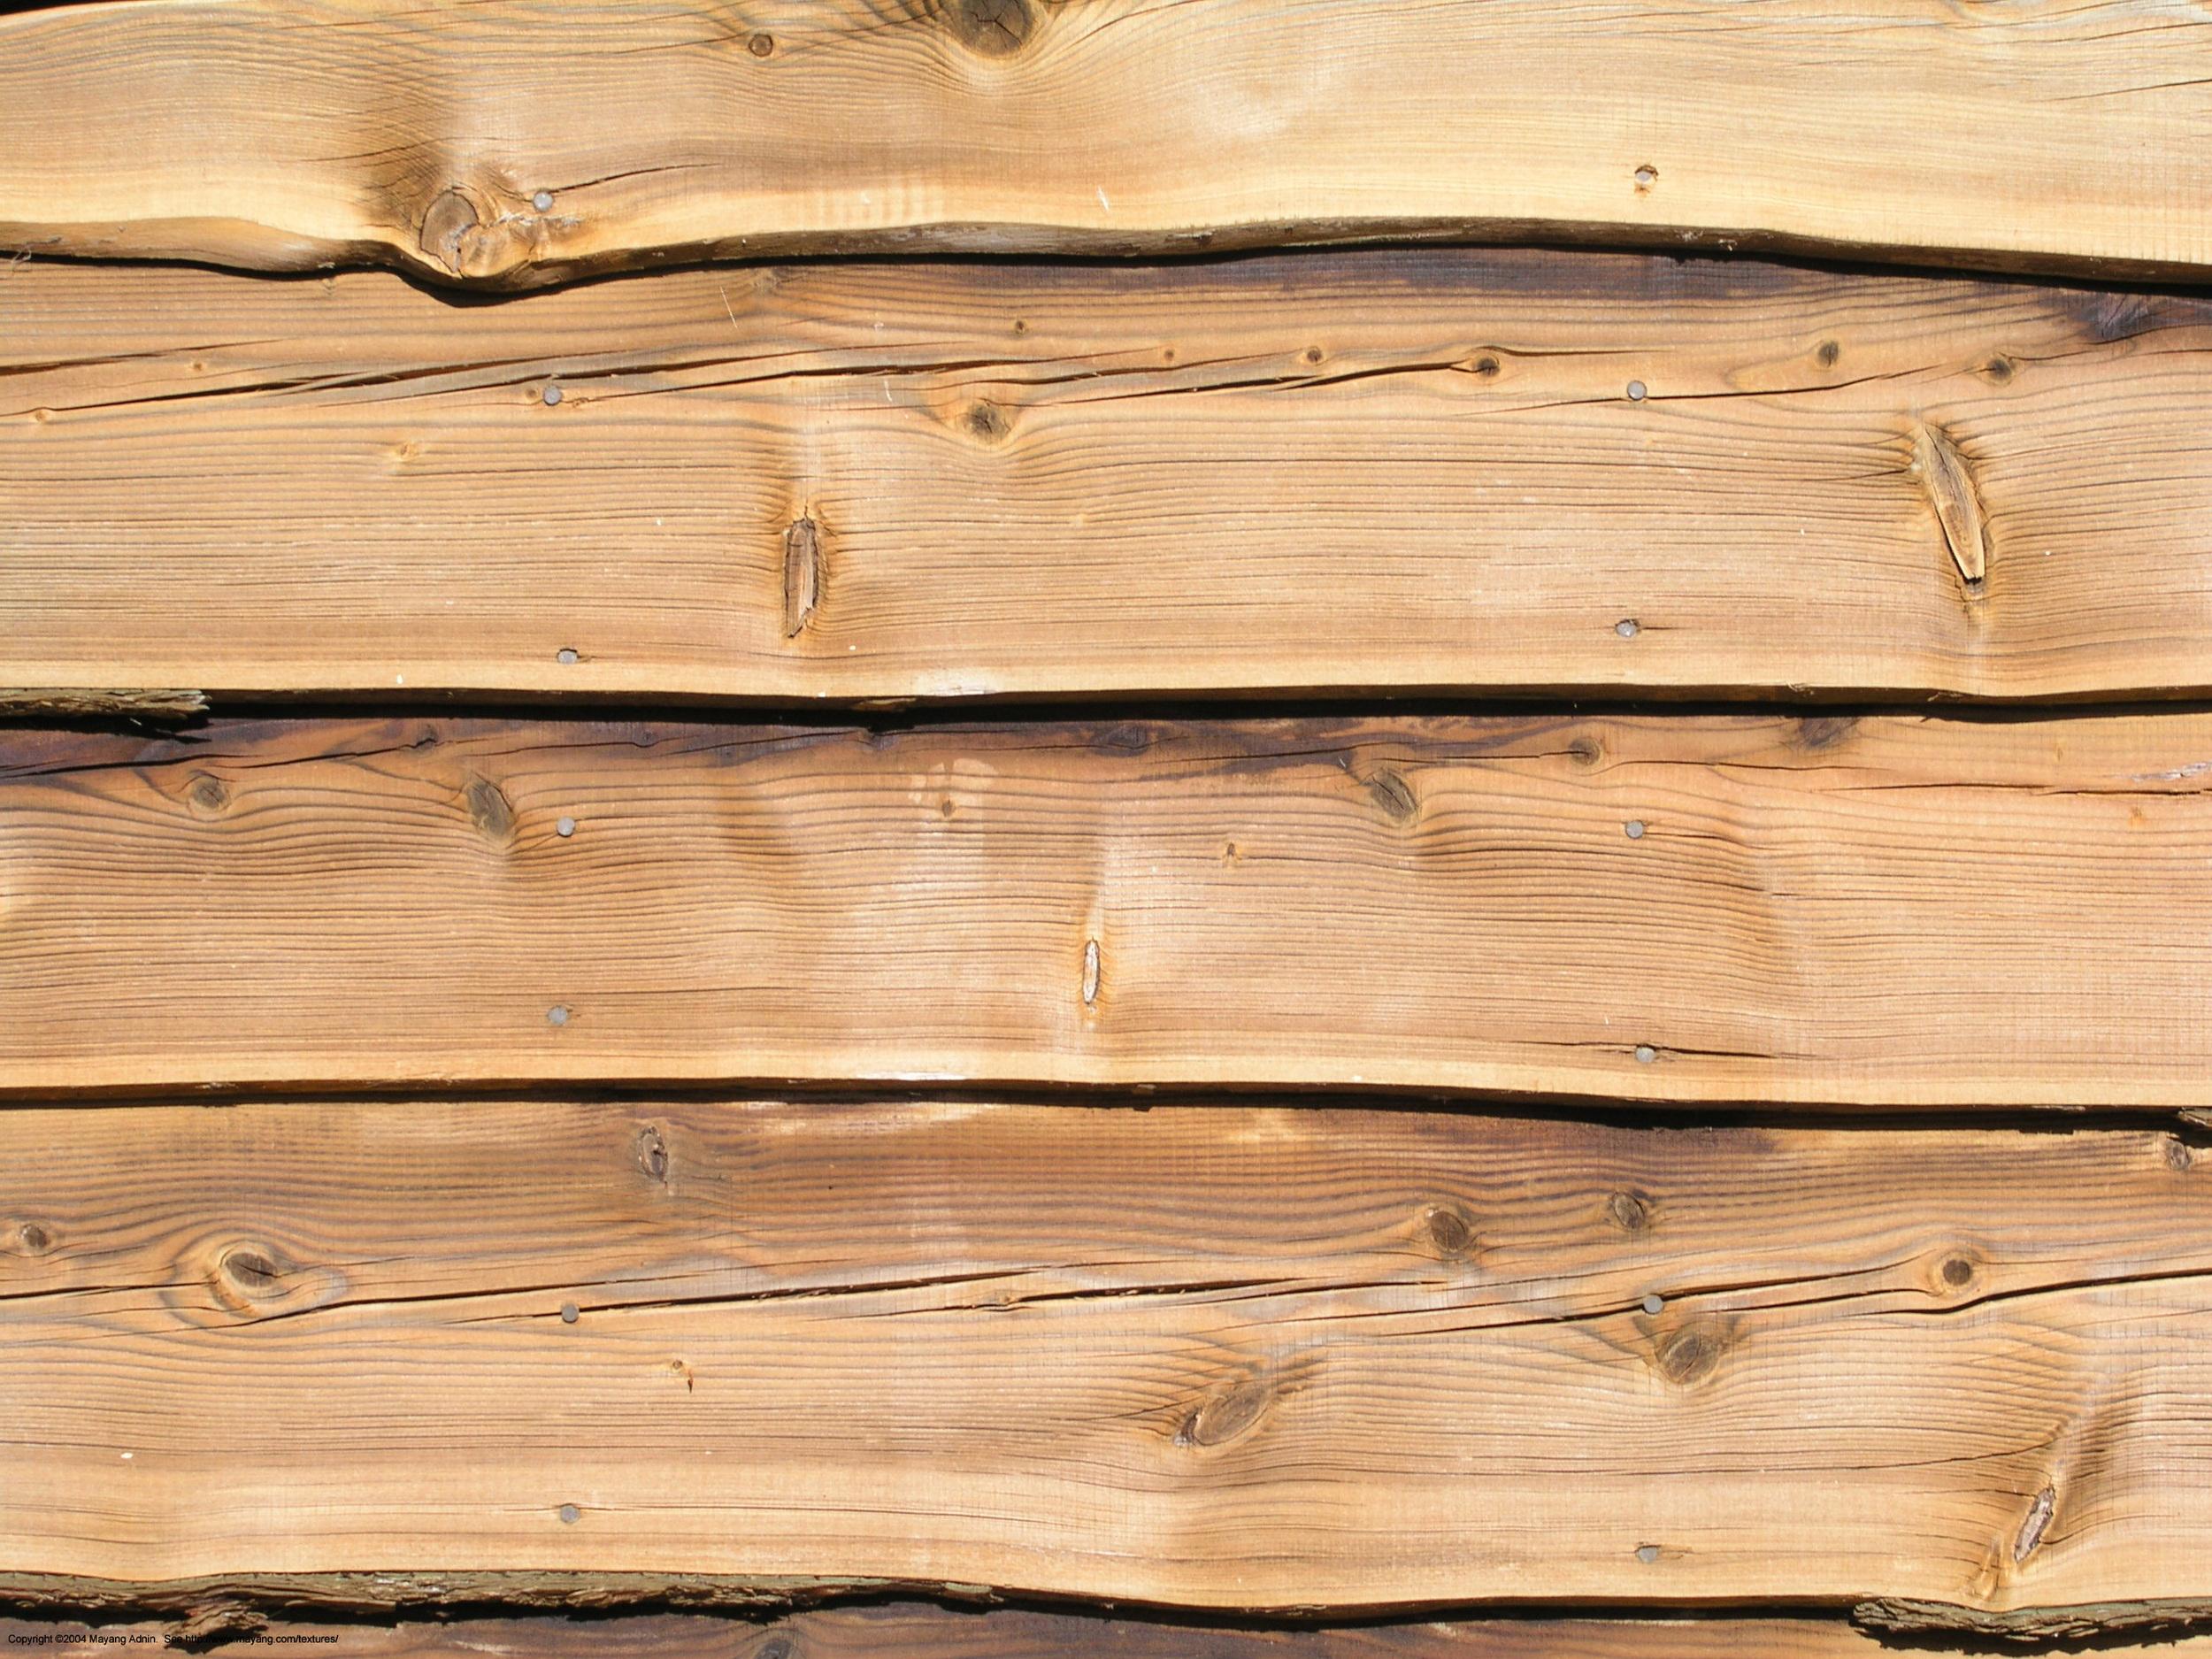 wooden_slat_fence_1010273.JPG